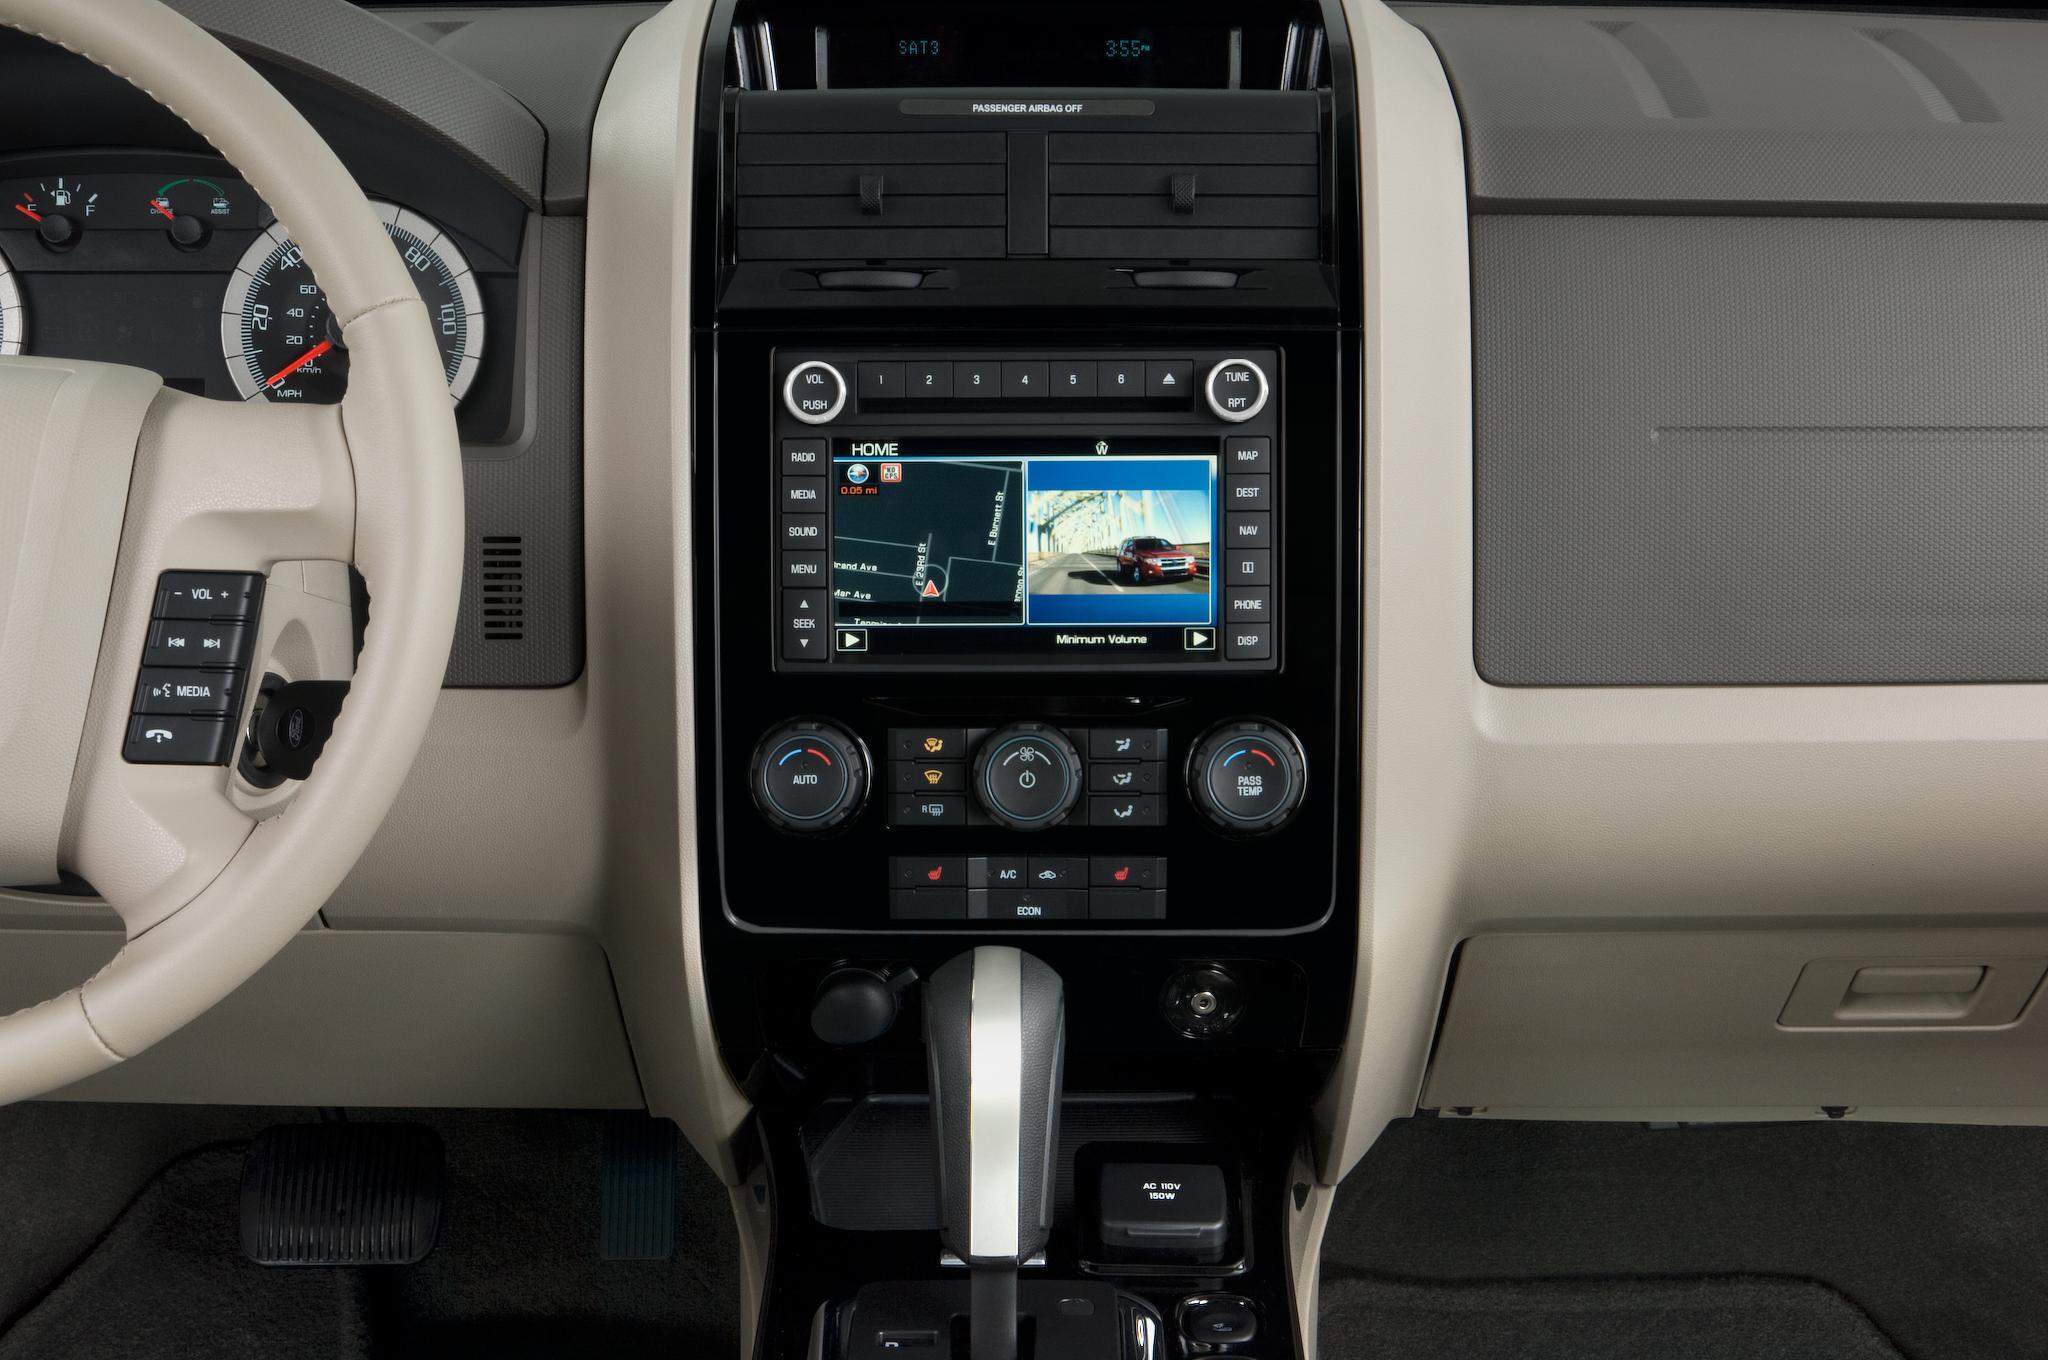 2012 Ford Escape Audio System Radio Hybrid Suv Review Automobile Magazine 2048x1360